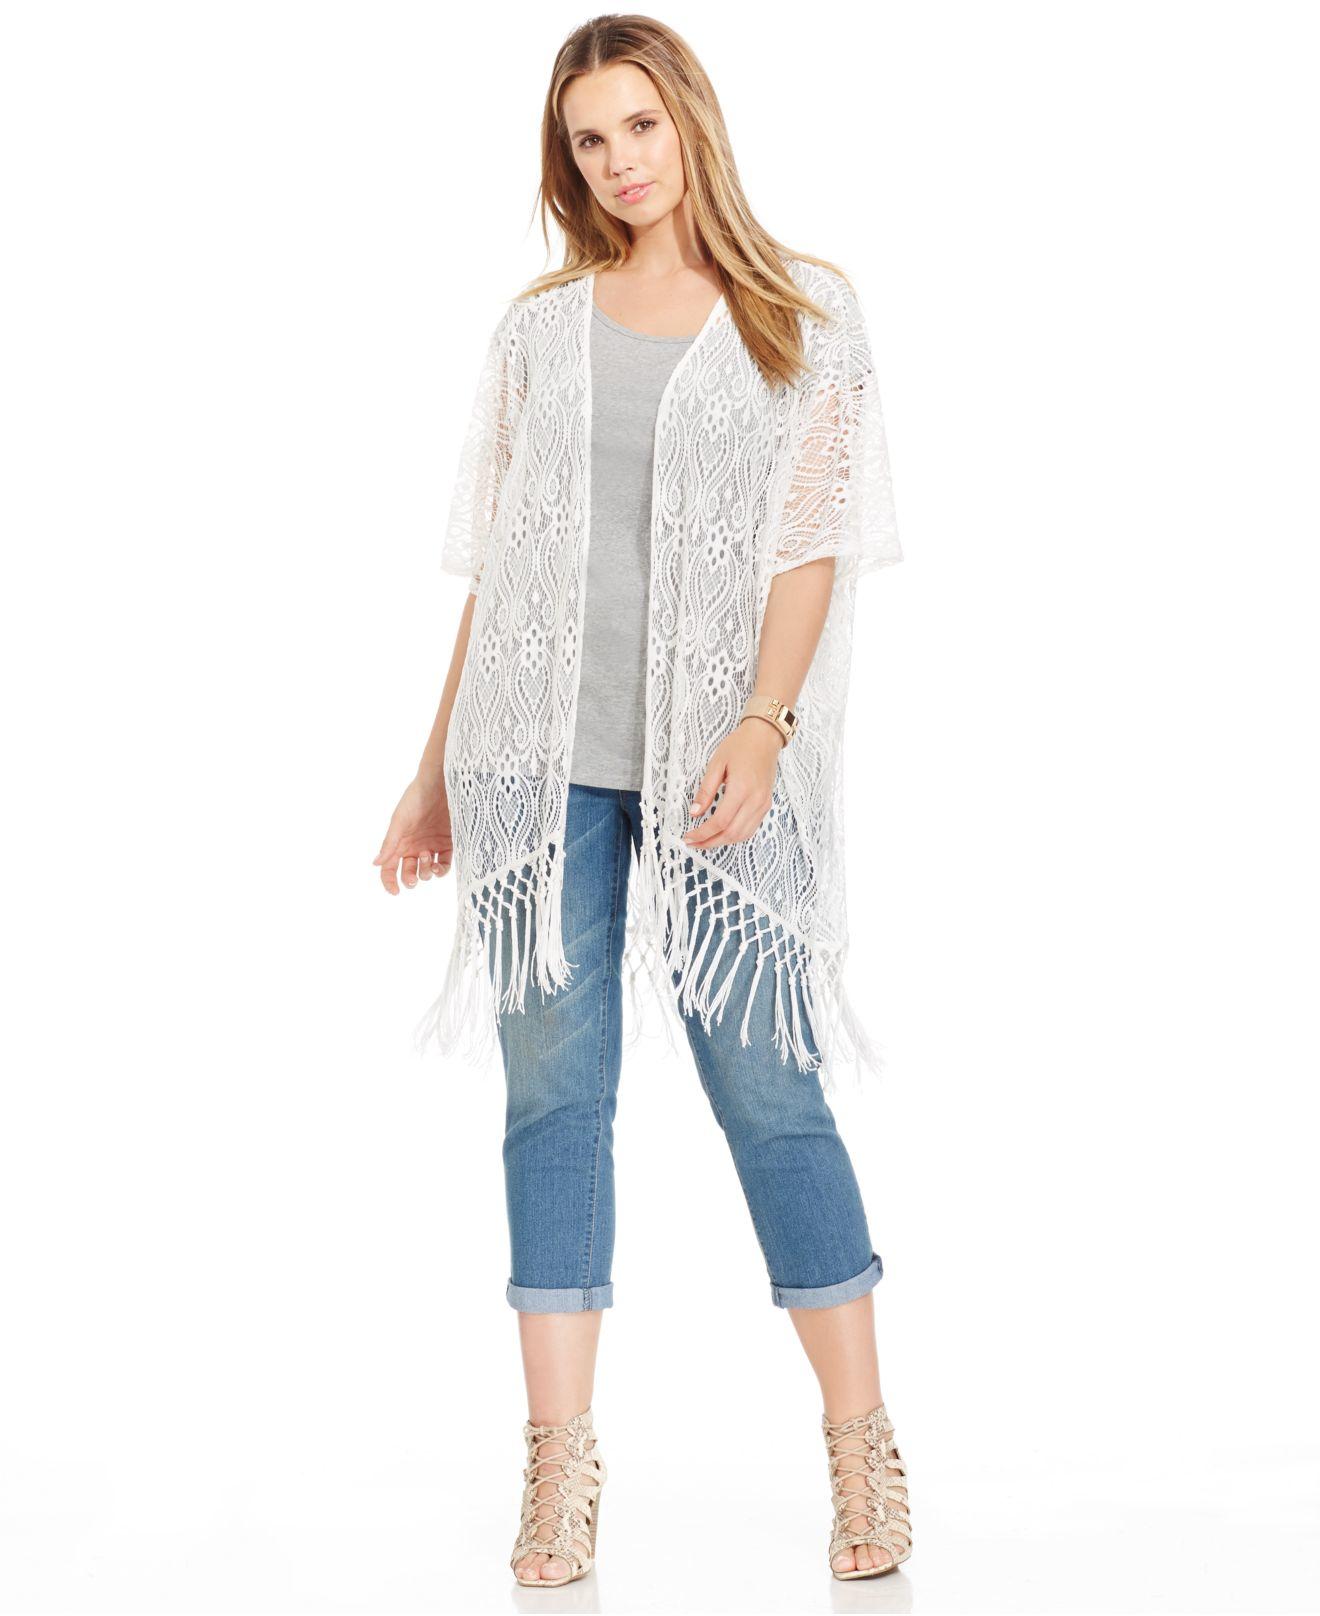 0c17c27bb Soprano Plus Size Fringed Lace Kimono Cardigan in White - Lyst